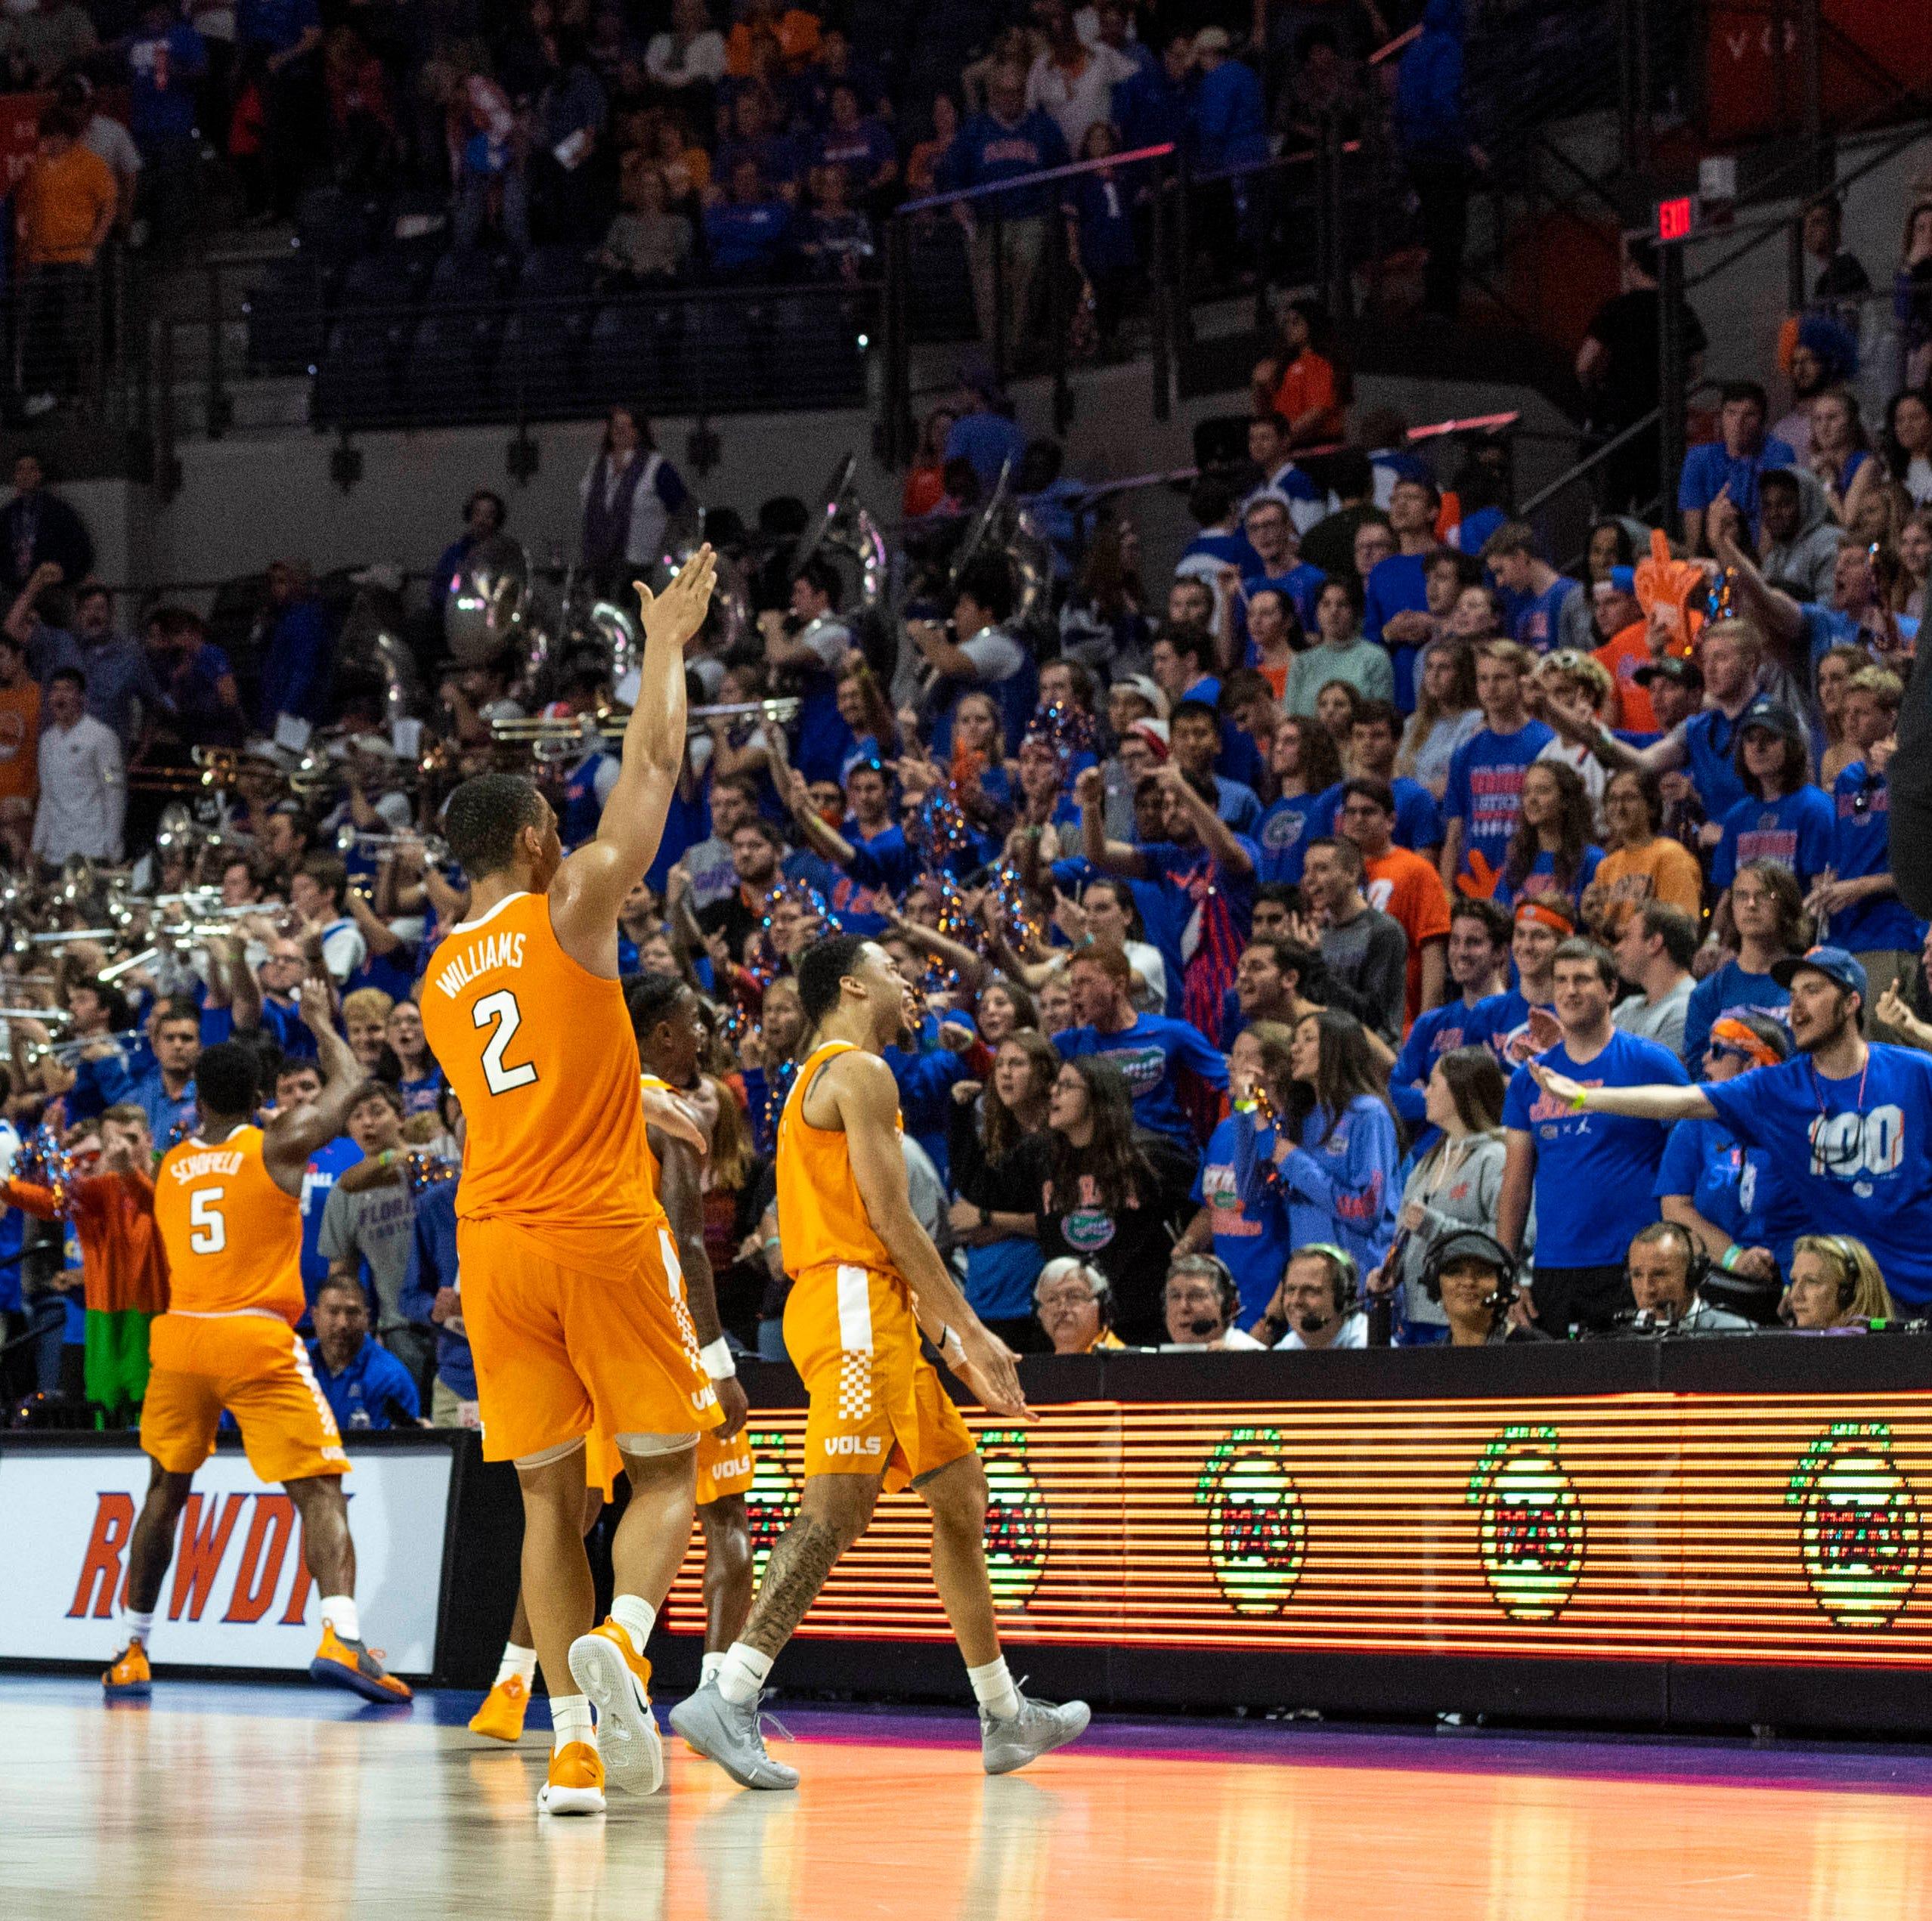 What UT Vols basketball coach Rick Barnes thought about Gator chomp celebration